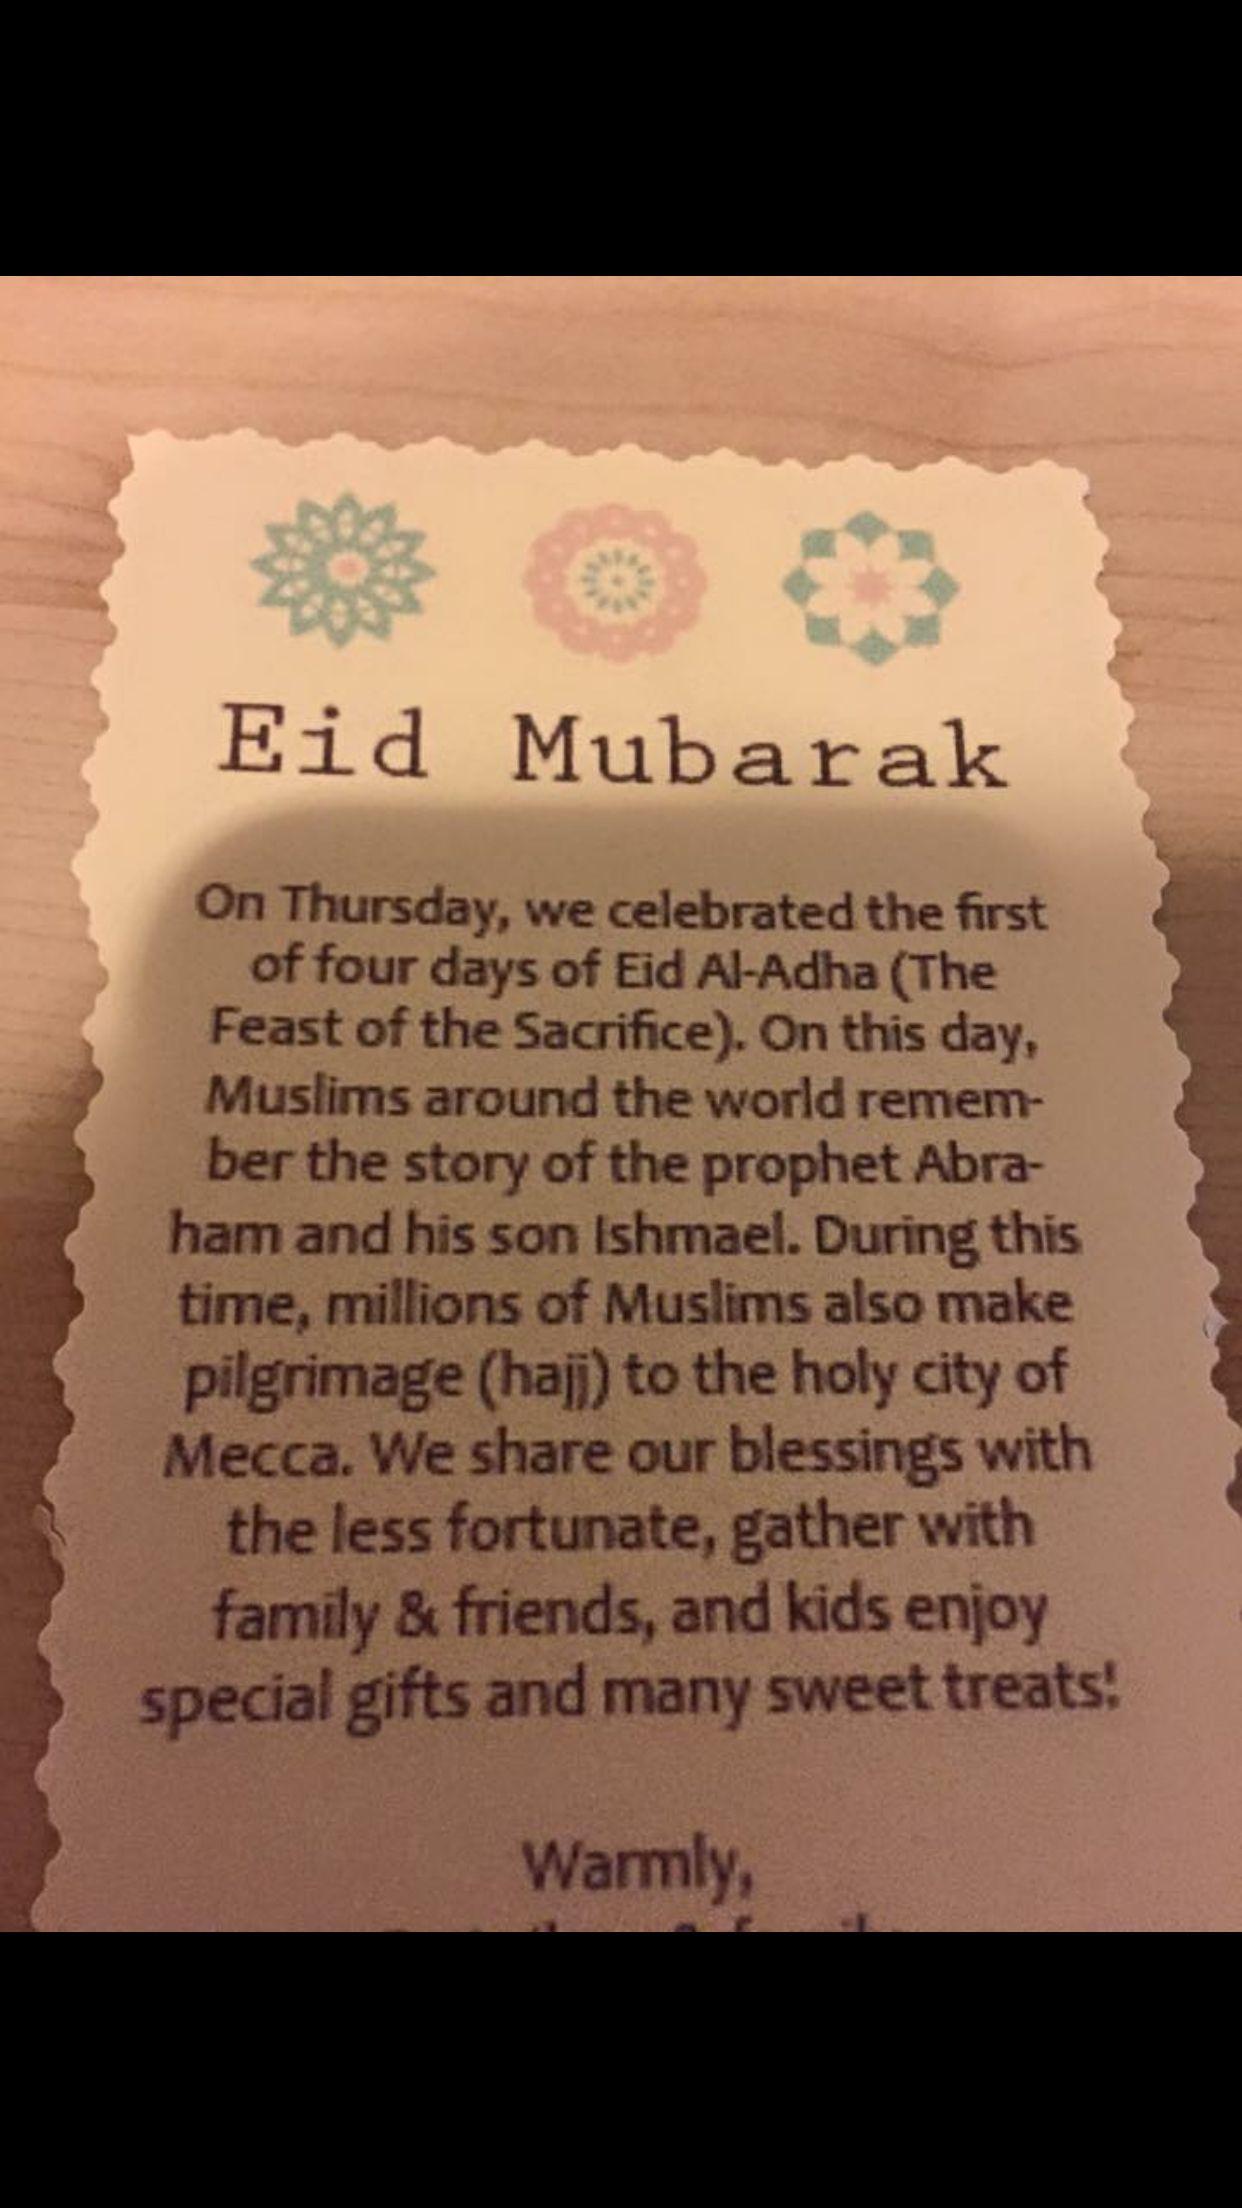 Eid al adha letter for classmates and neighbors to understand the eid al adha letter for classmates and neighbors to understand the holiday stopboris Choice Image